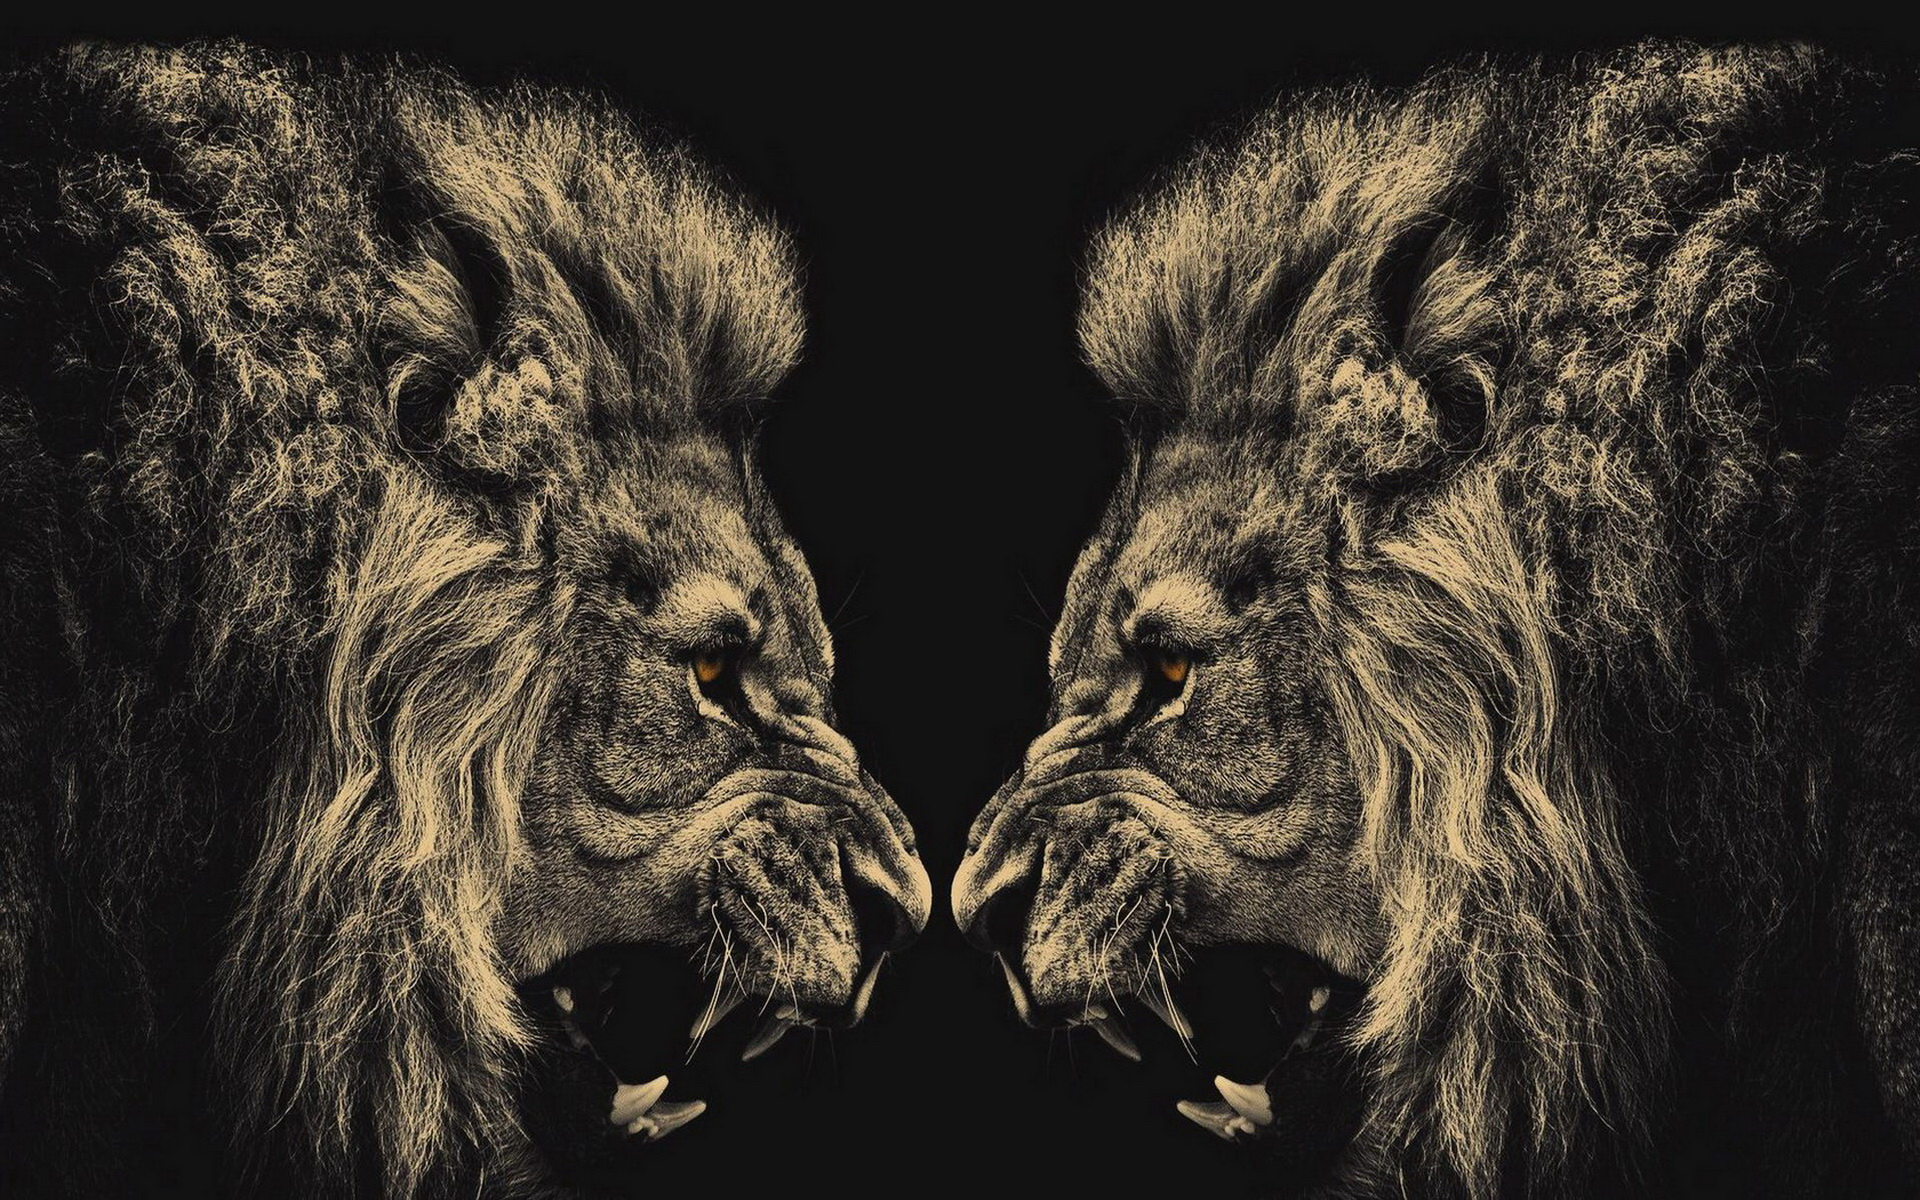 lion wallpaper screensaver hd #10258 wallpaper | walldiskpaper